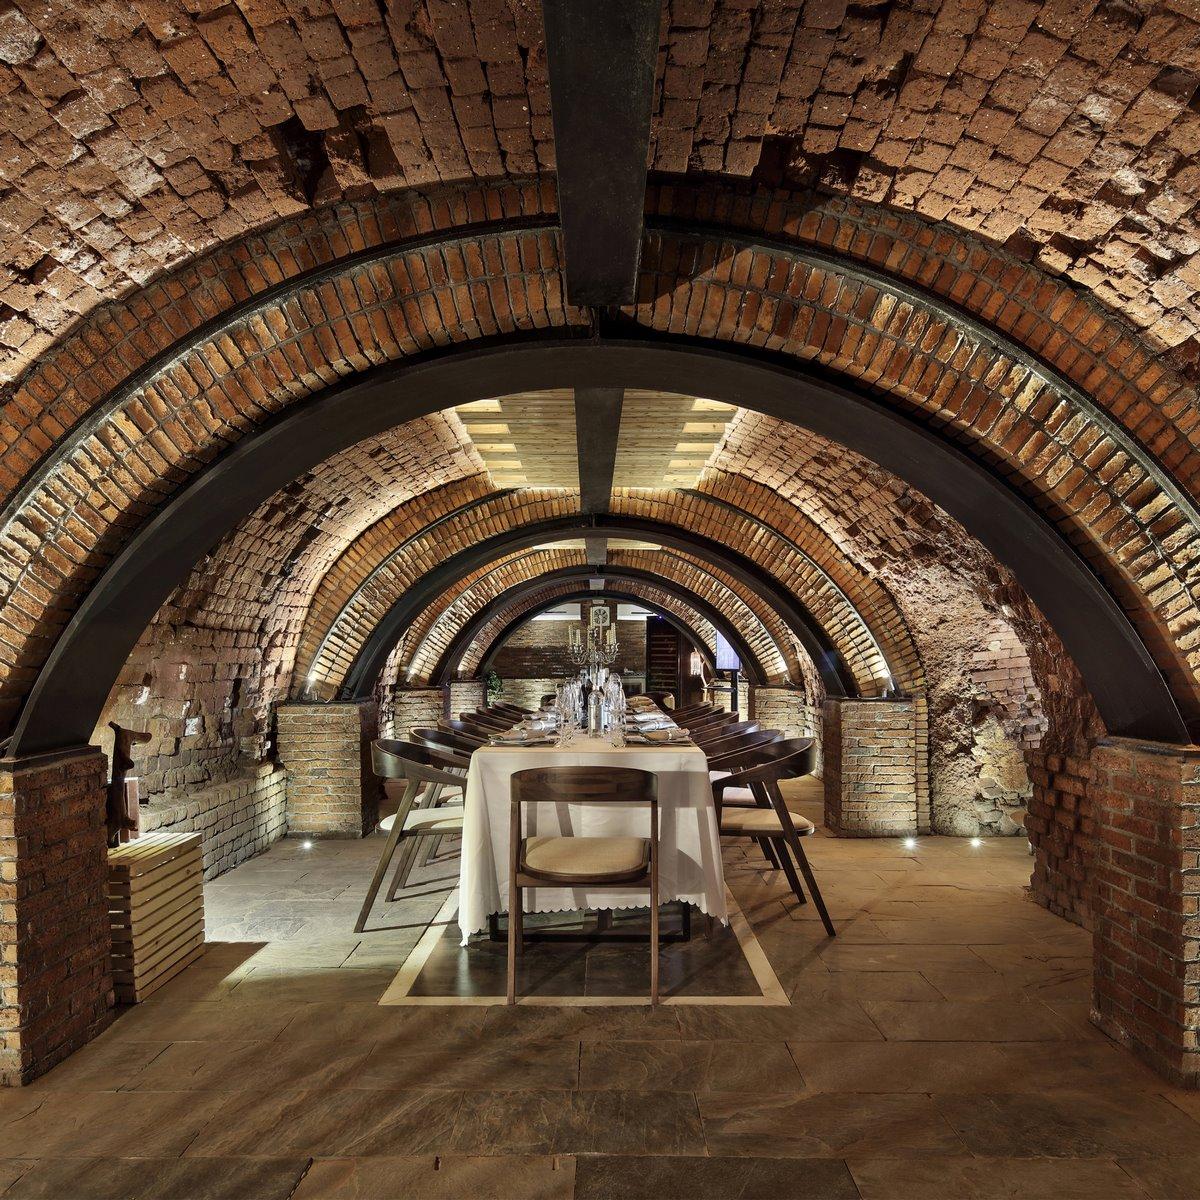 62522-218304-brickkiln-folk-inn-and-museum-5 (Copiar)